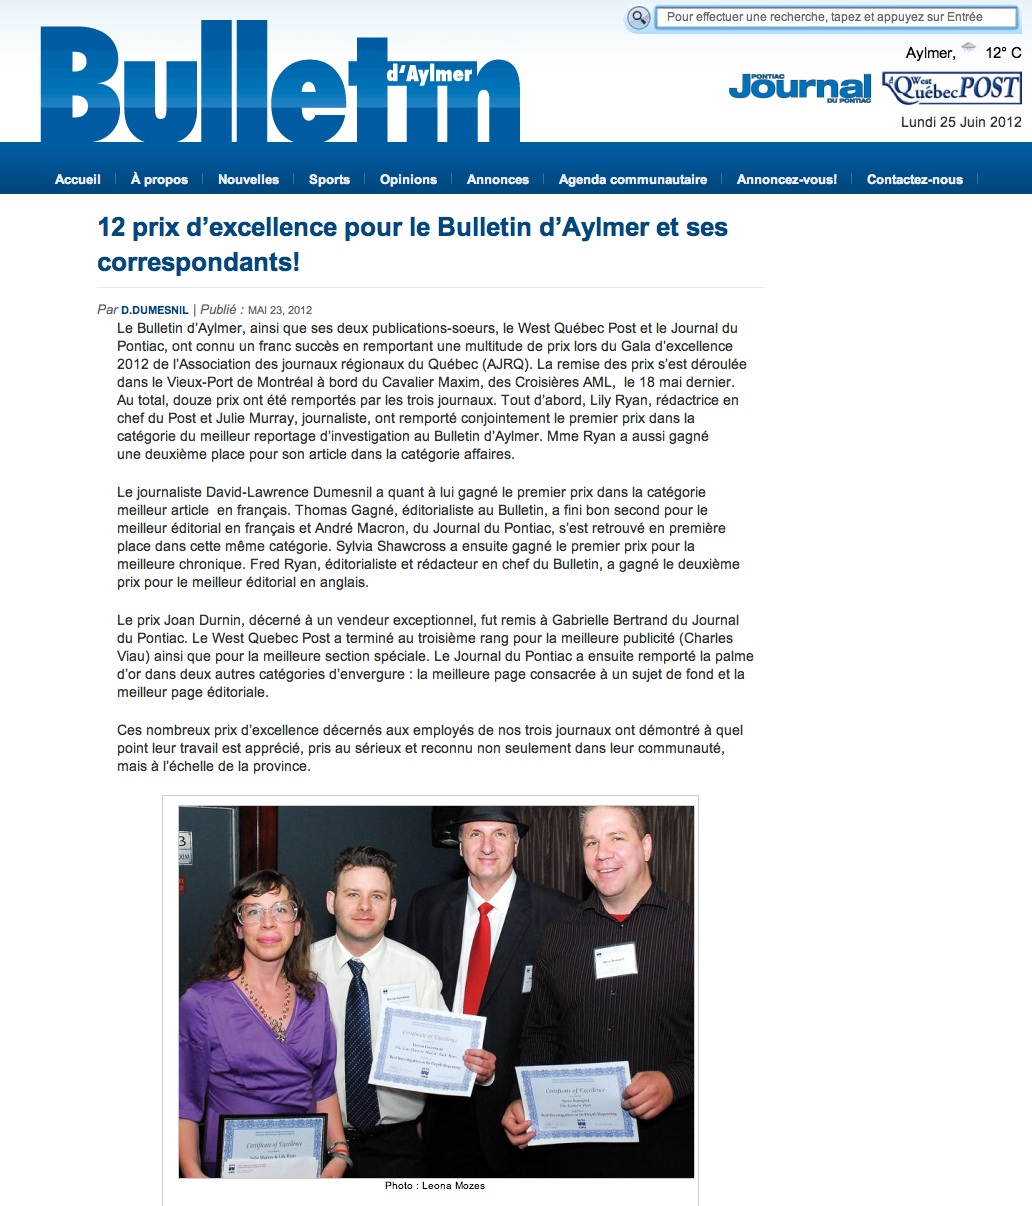 Bulletin d'Alymer June 25, 2012 http://www.bulletinaylmer.com/en/